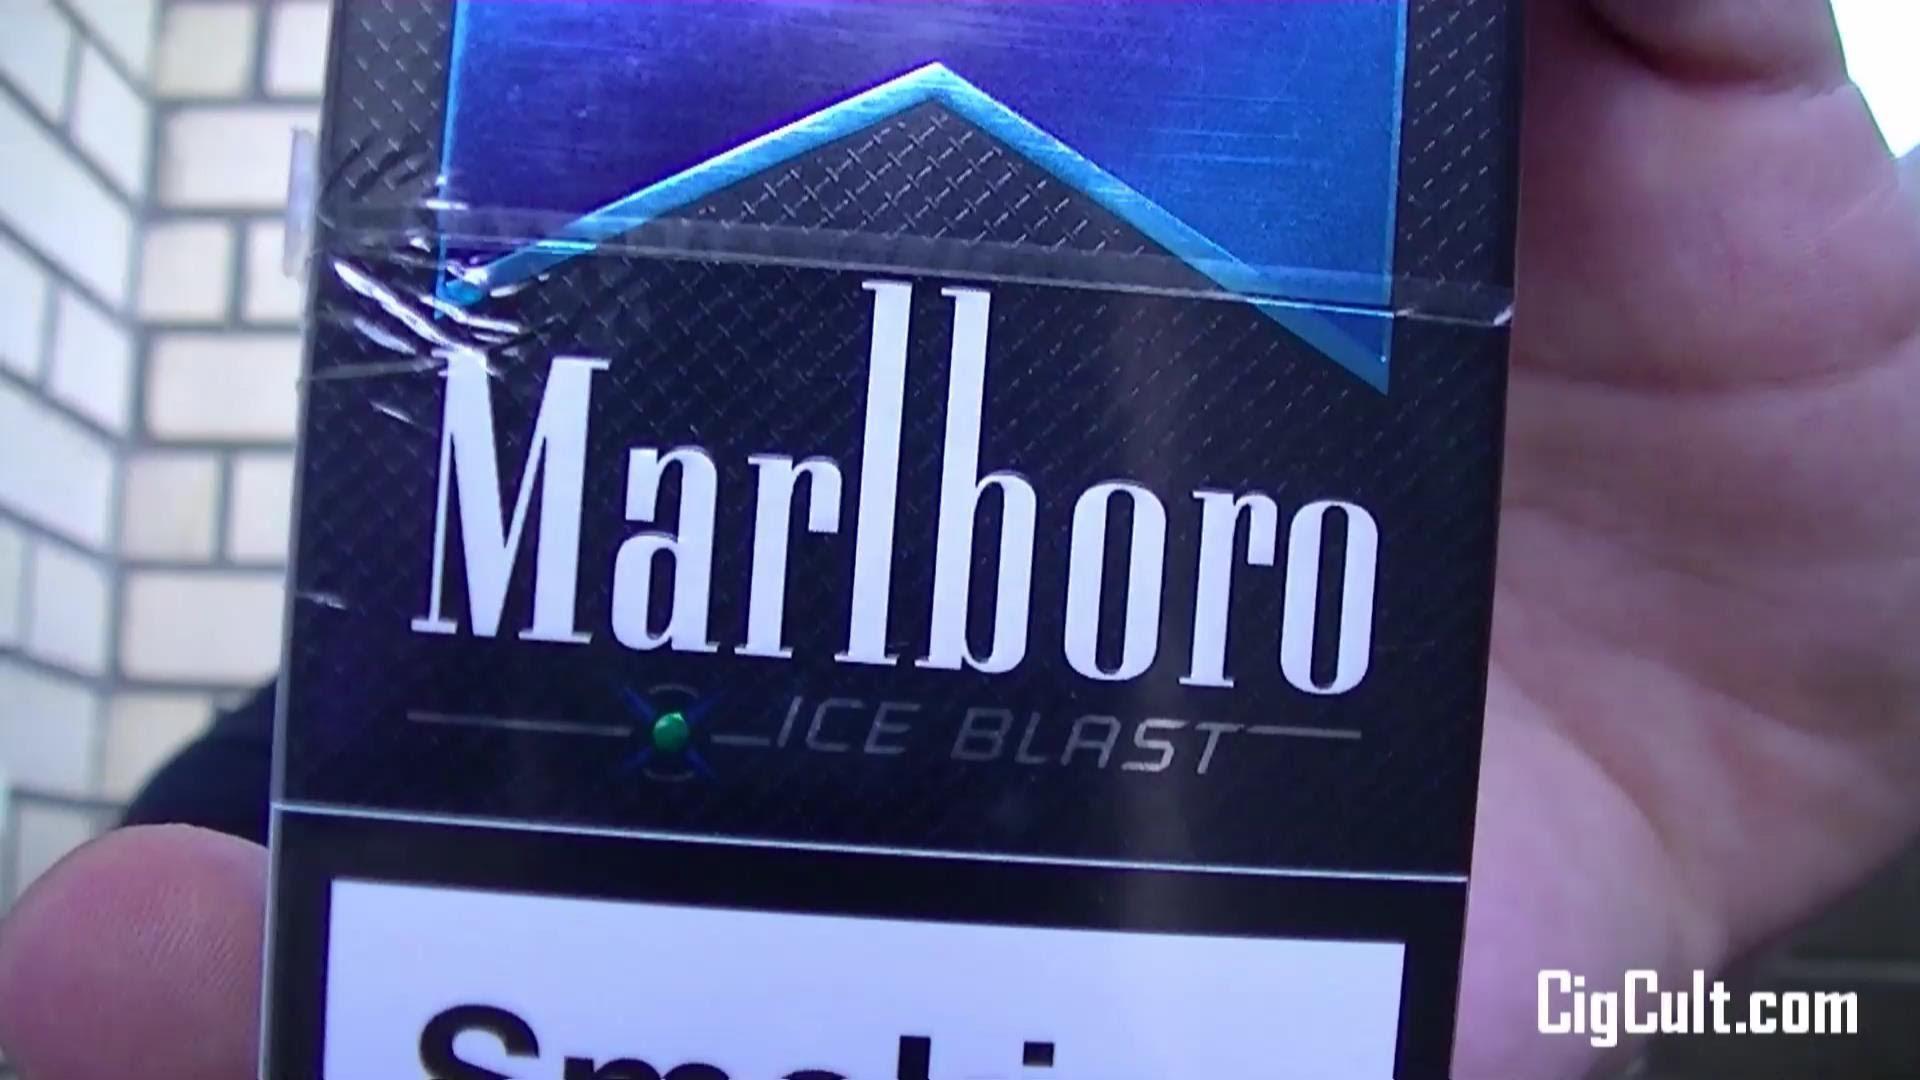 Download Marlboro Ice Blast Wallpaper Gallery 1920x1080